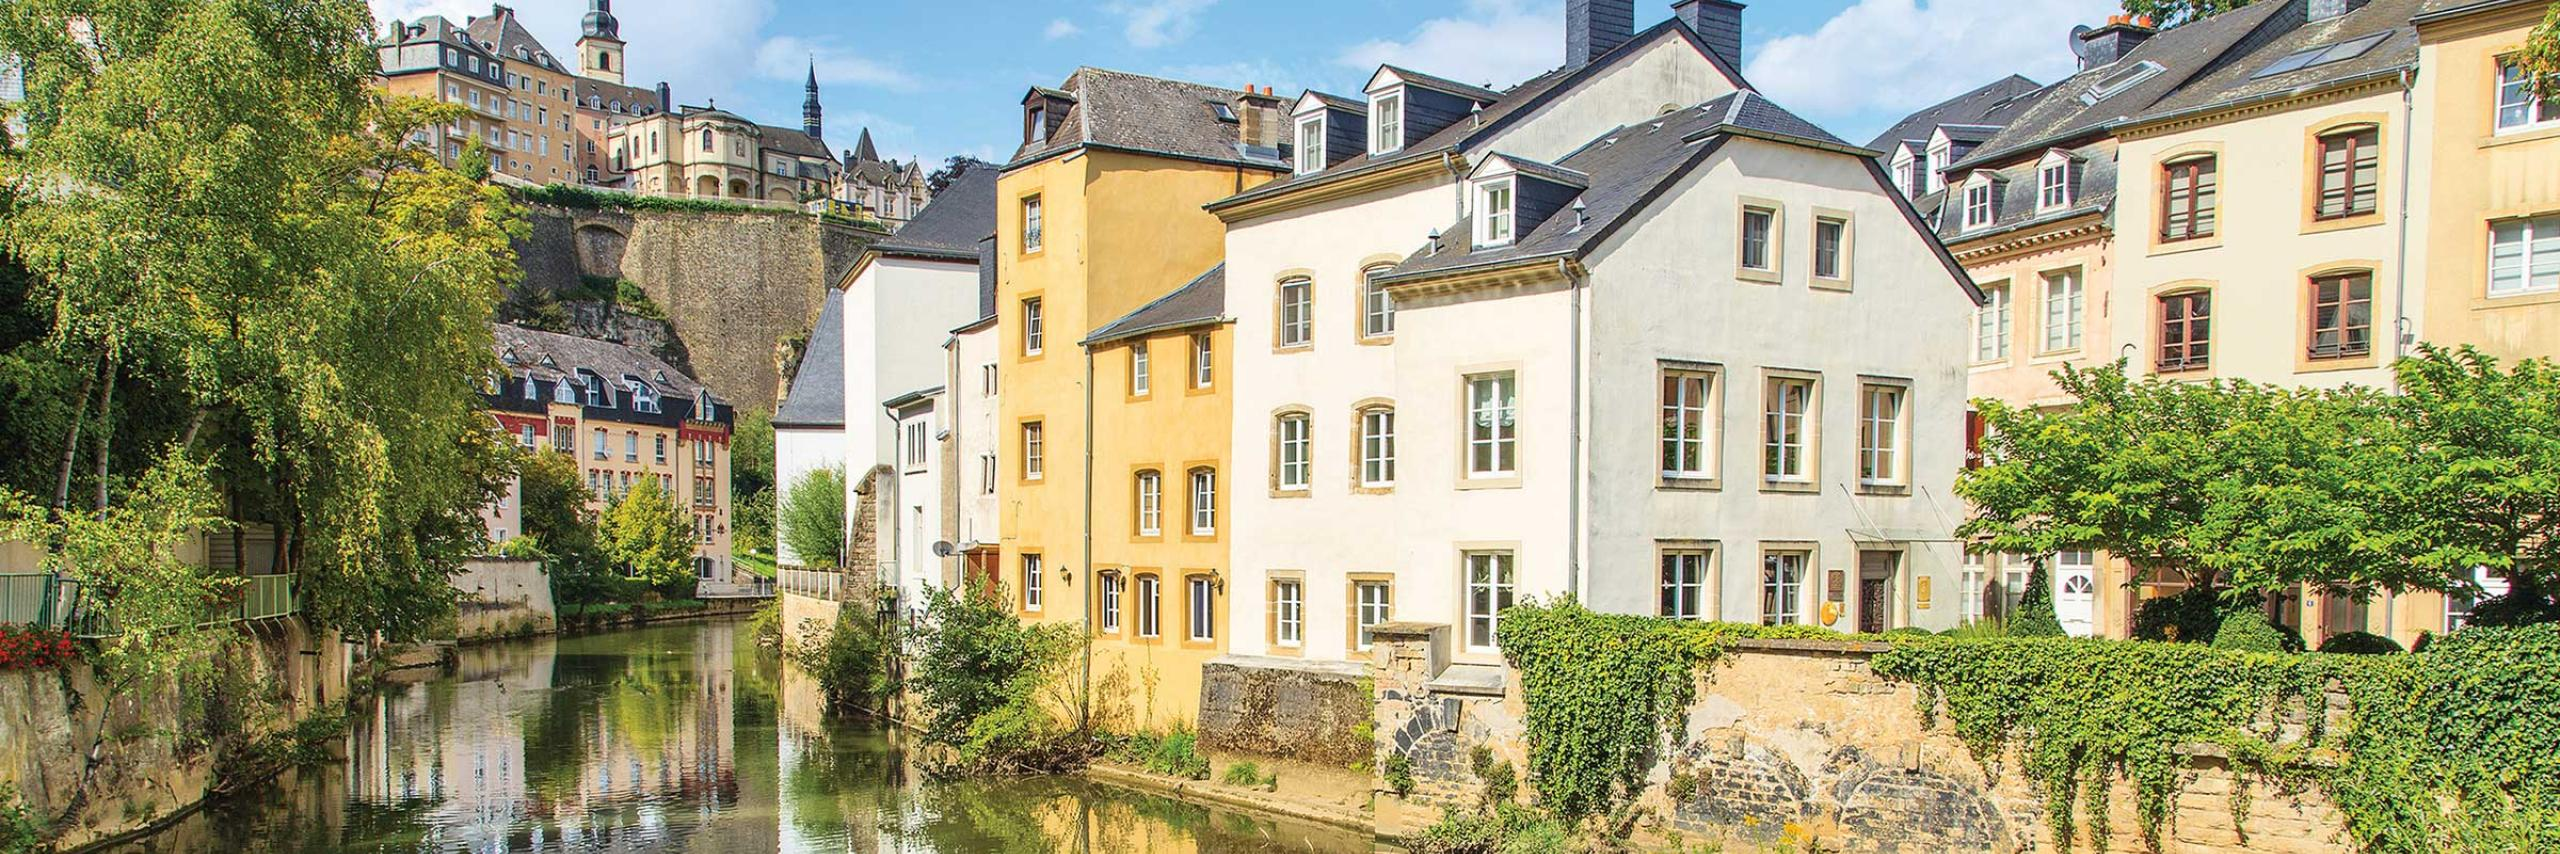 Internorte-Intercentro Luxemburgo